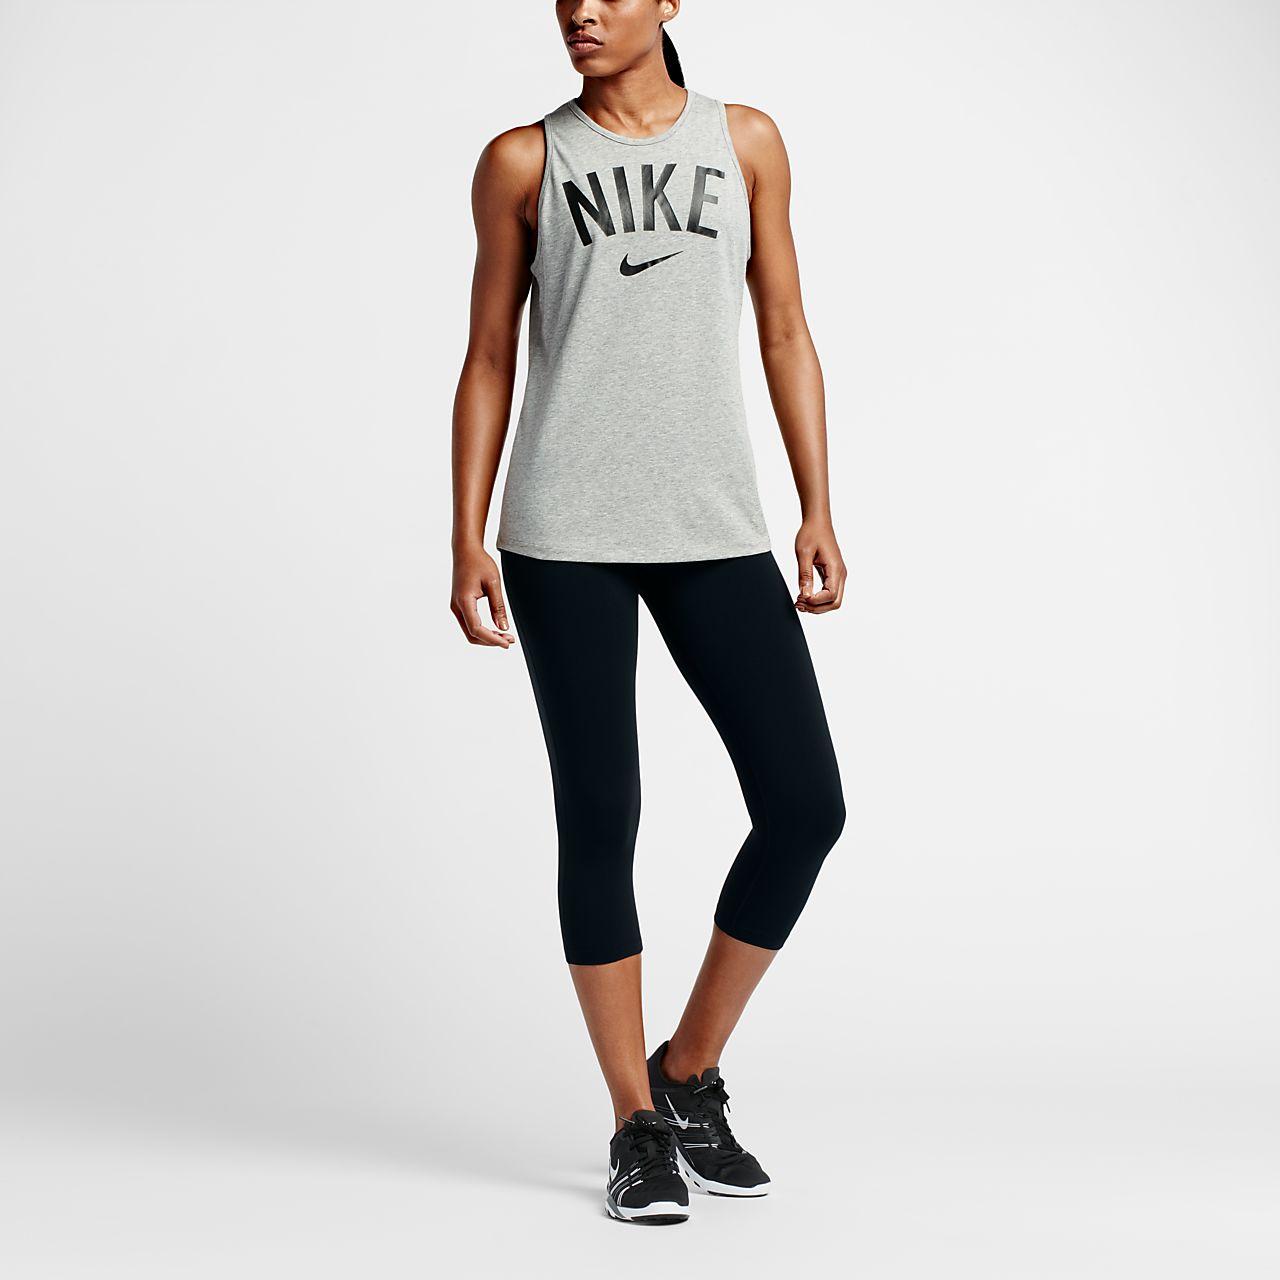 Nike hose xl